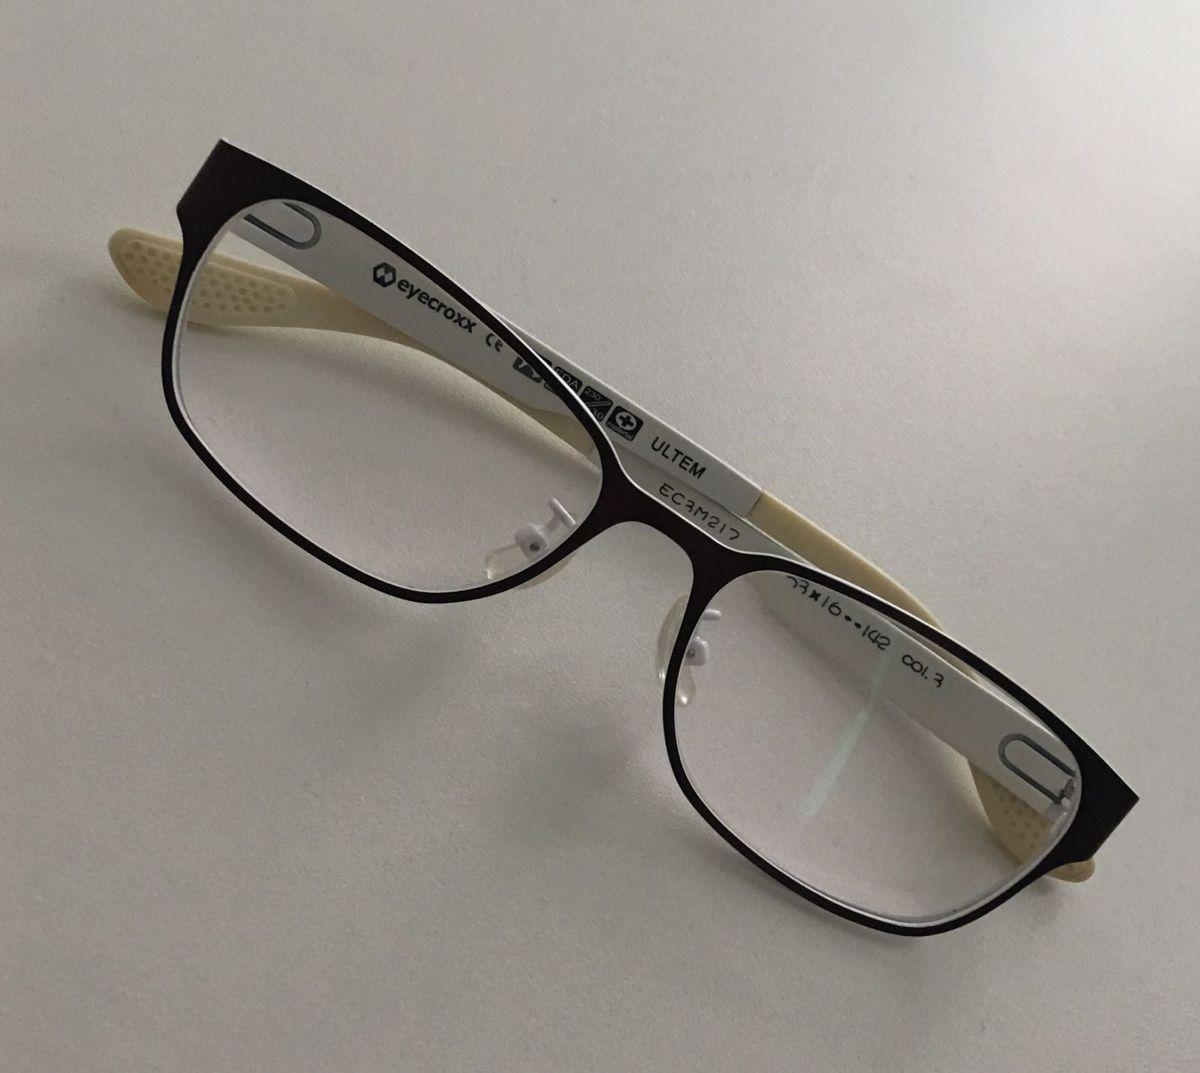 4c17ae5d7d20a óculos de descanso - óculos sem marca.  Czm6ly9wag90b3muzw5qb2vplmnvbs5ici9wcm9kdwn0cy81ndgzndi3lzzlytm1mjnintzjngm2mmu5zjezyzzmyzm3ymm5ndg1lmpwzw